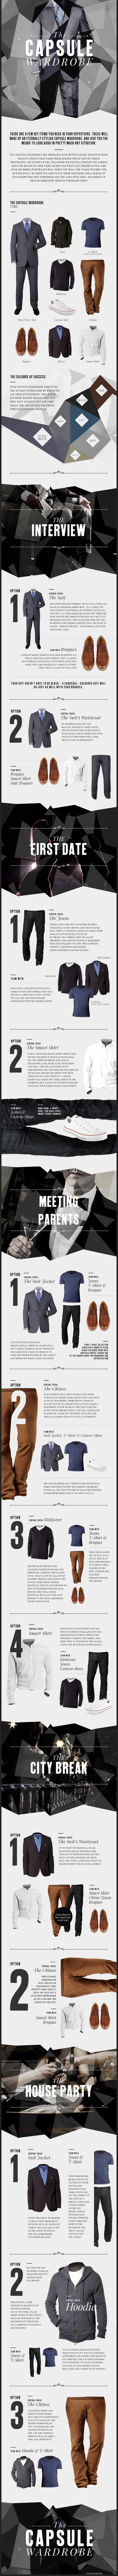 Men's Fashion Advice